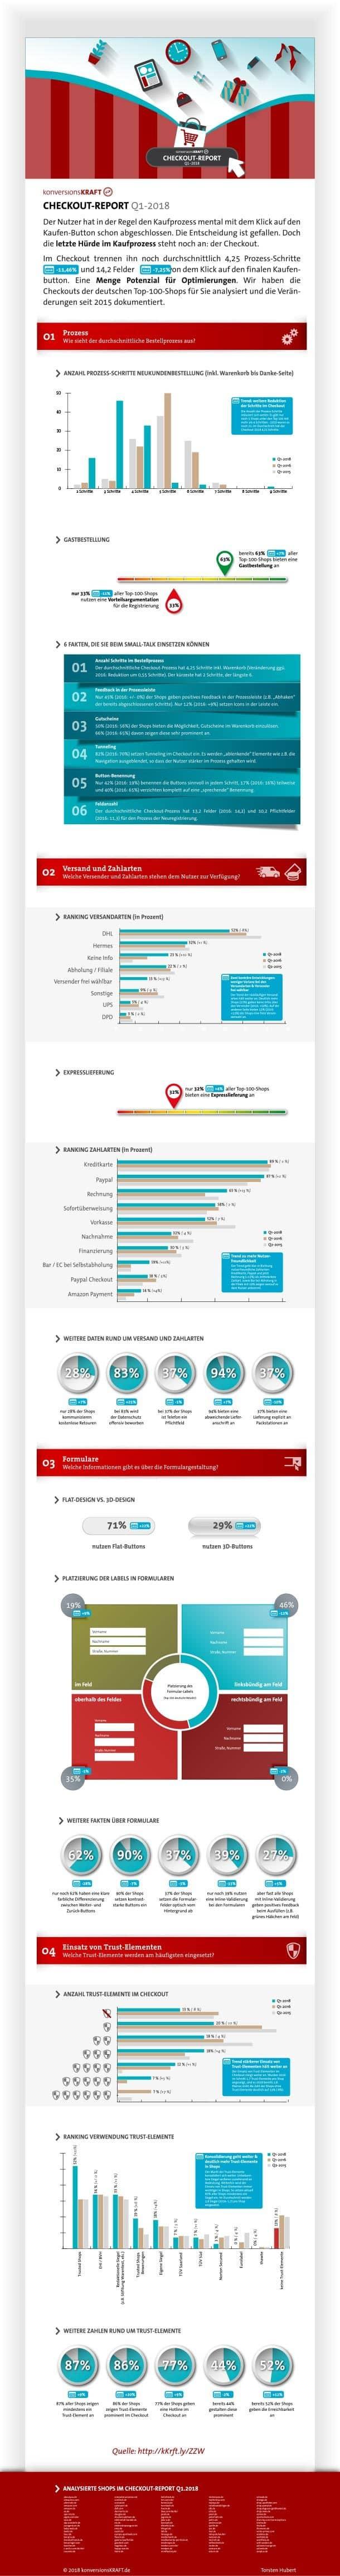 konversionsKRAFT Infografik Checkout 2018